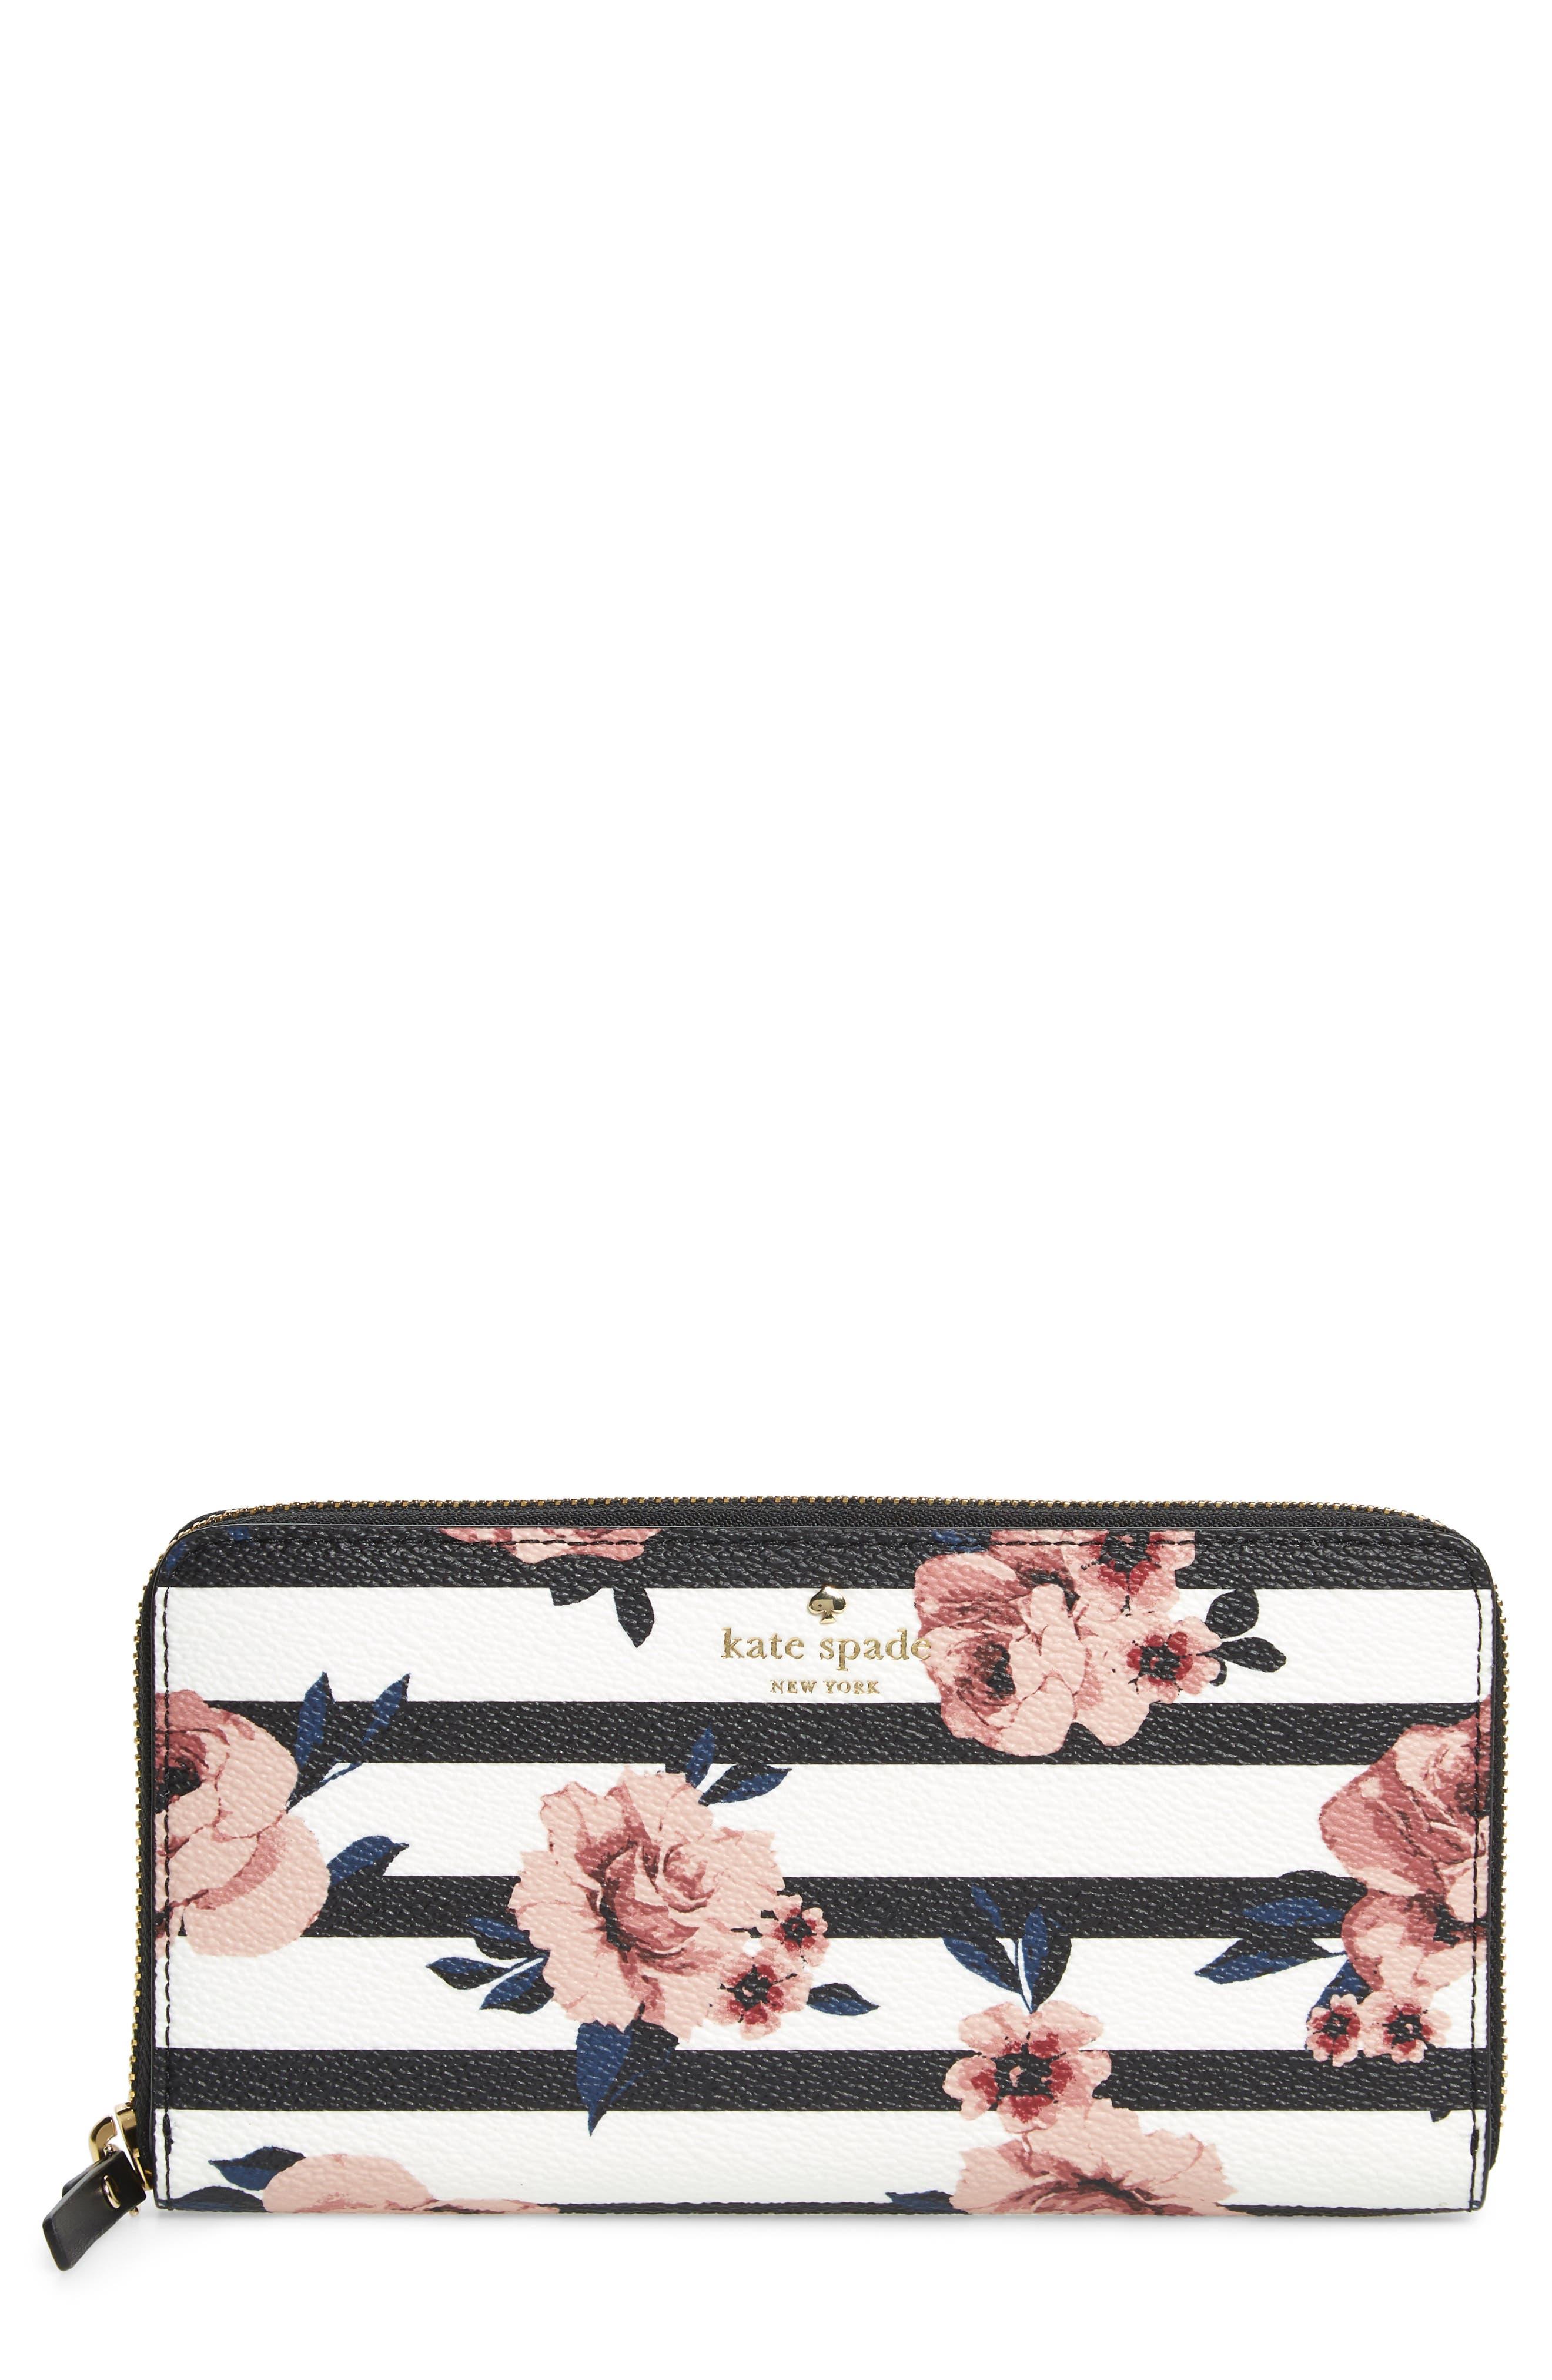 KATE SPADE NEW YORK,                             hyde lane - rose stripe lacey zip around wallet,                             Main thumbnail 1, color,                             001